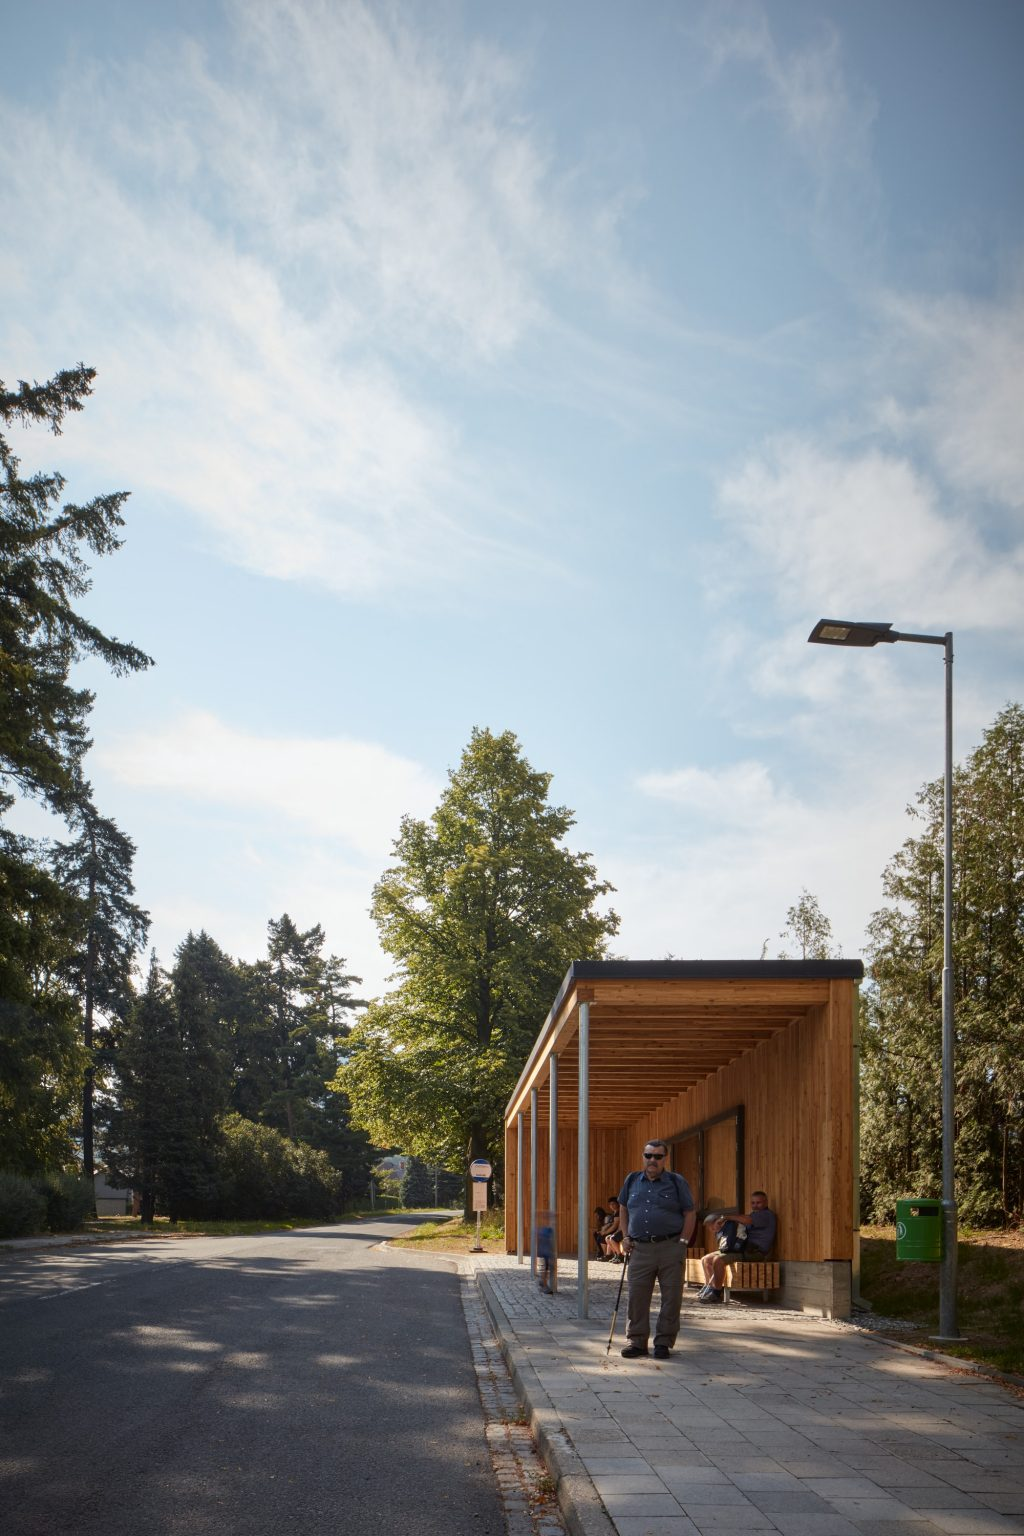 Bus Stop Design By Valarch Studio